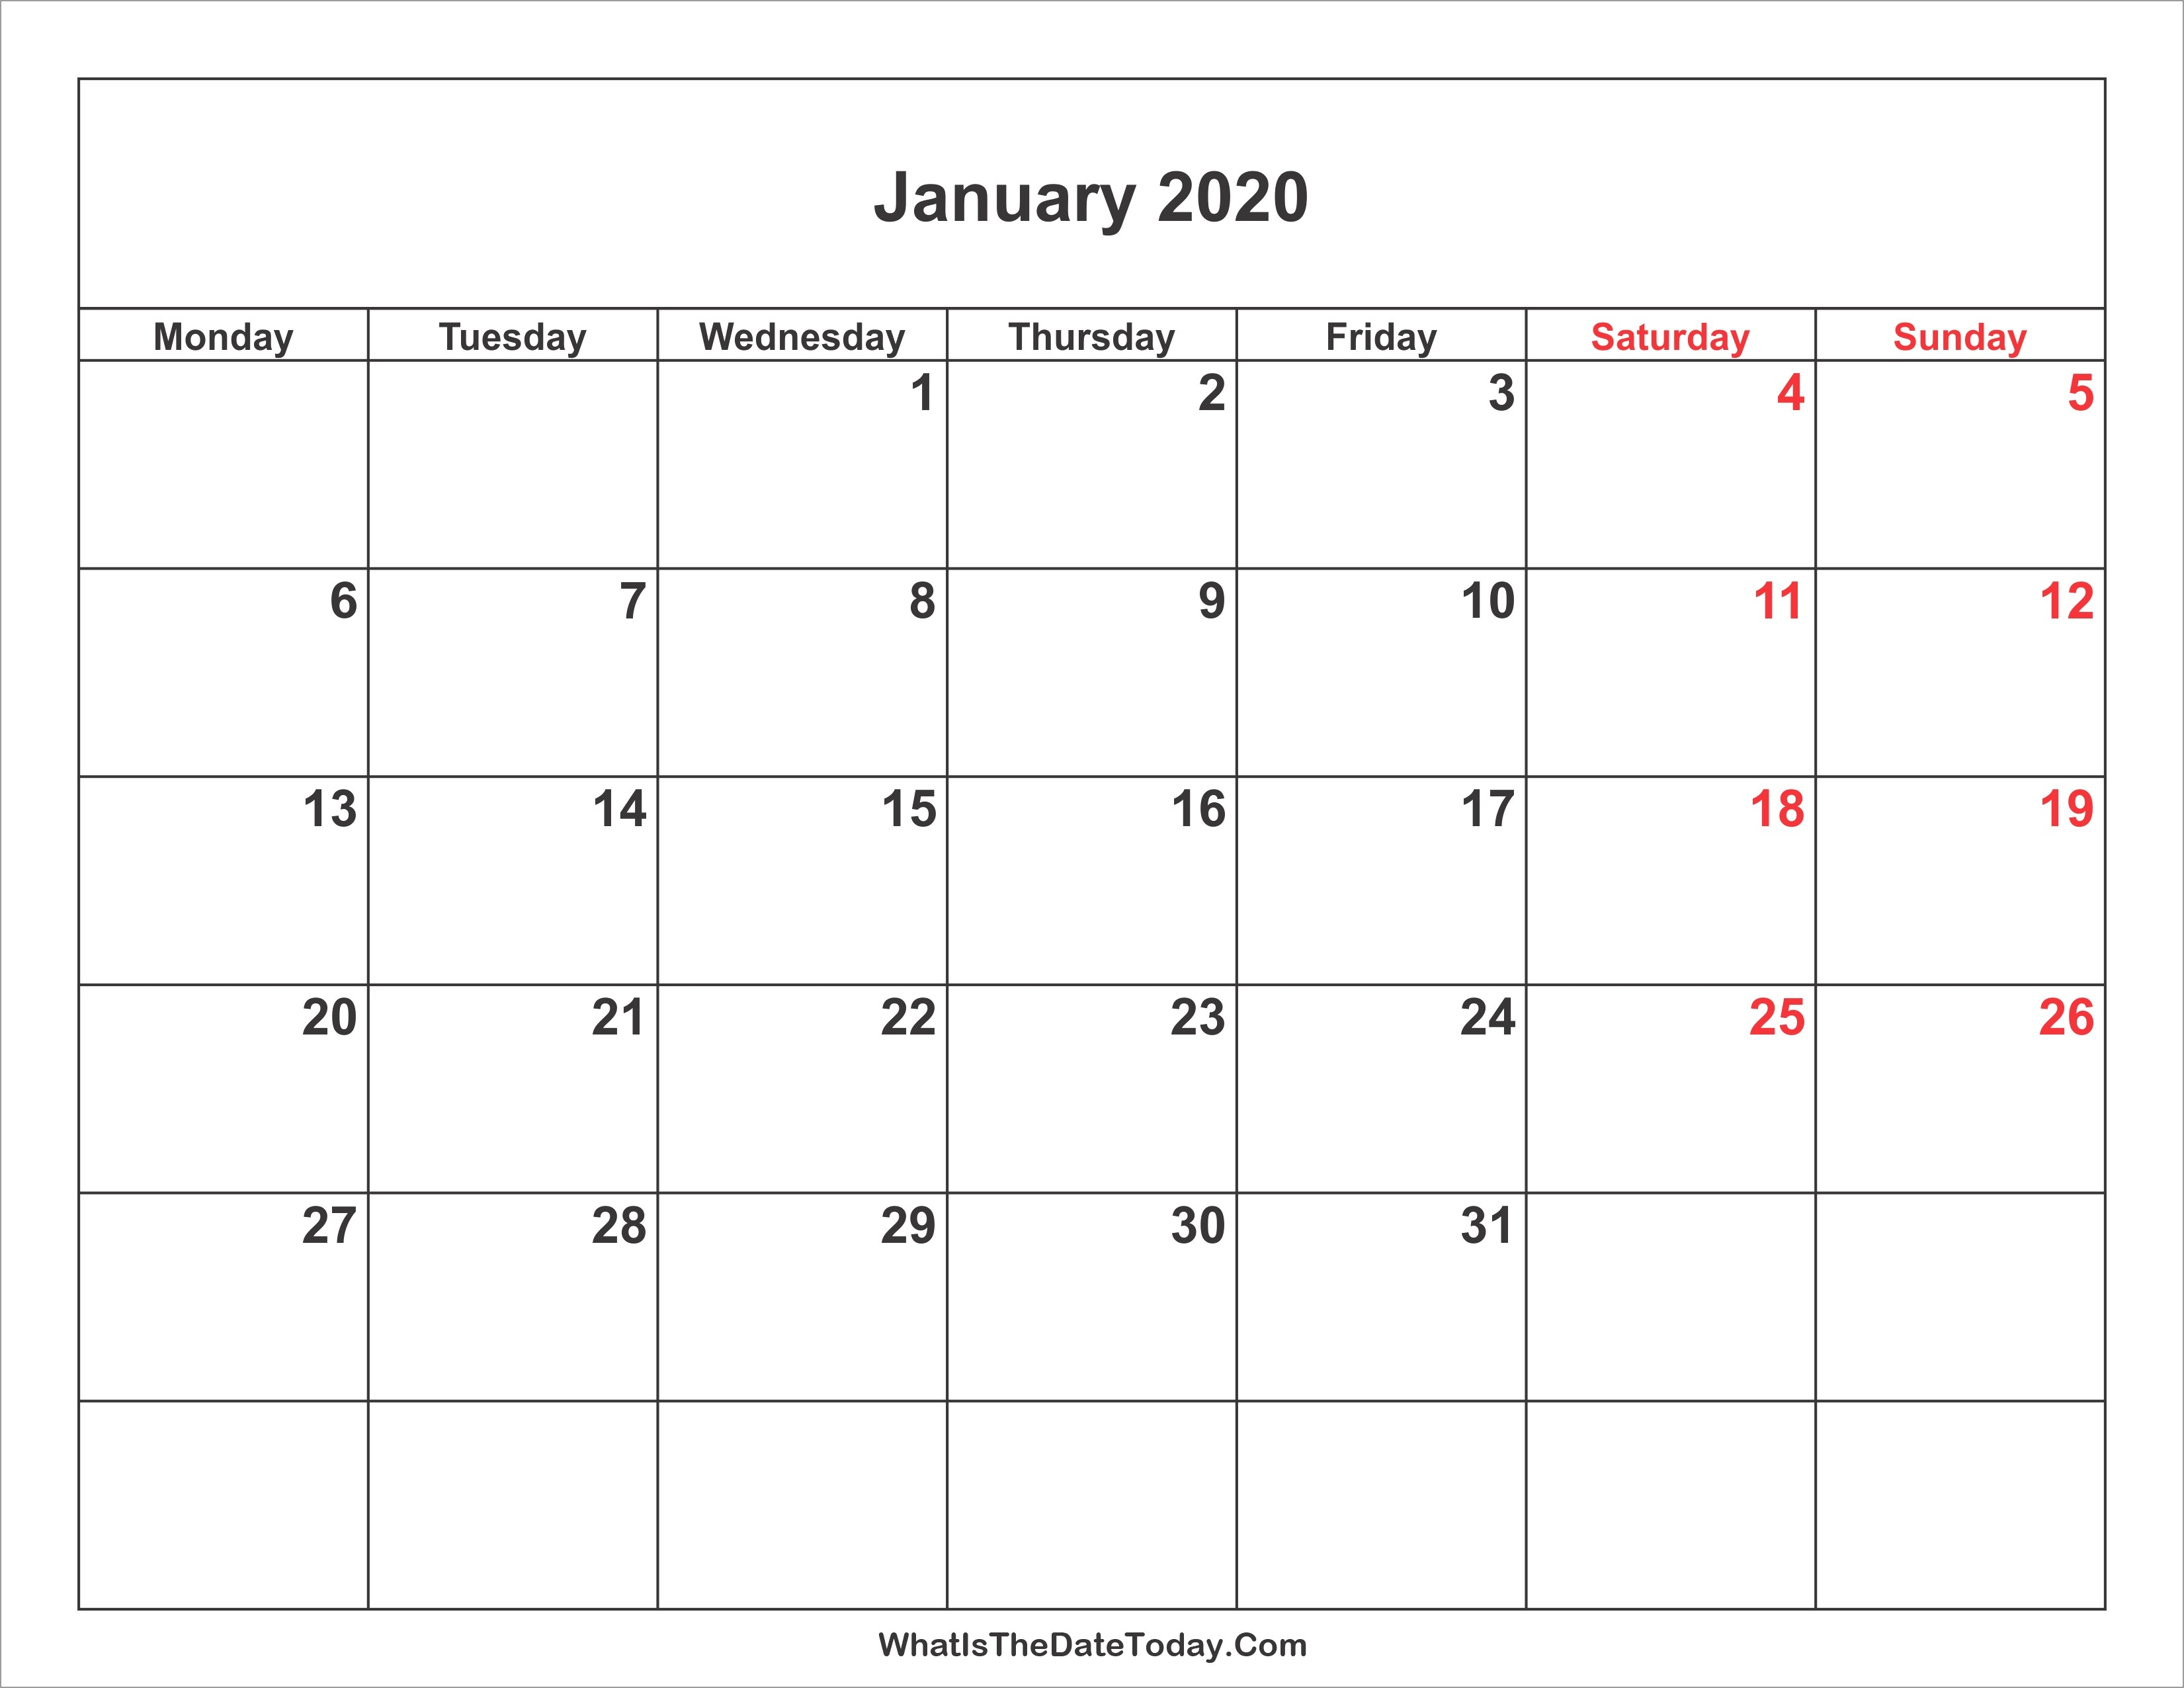 January 2020 Calendar | Jcreview-Large January 2020 Calendar